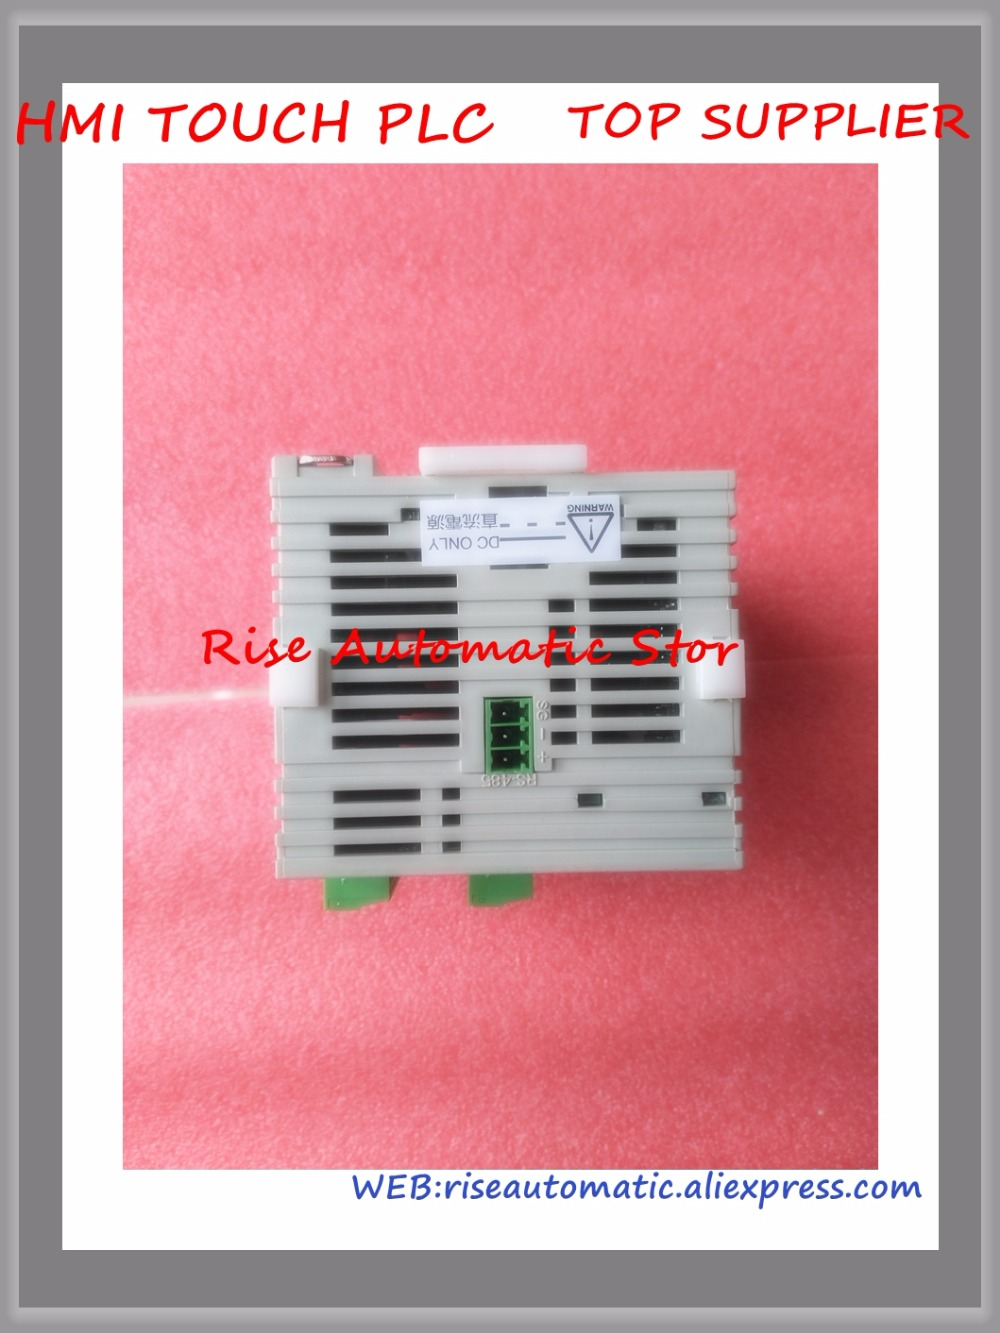 DVP20SX211T Delta New Original PLC SX2 series 24VDC 8DI 6DO (Transistor NPN) 4AI/2AO dvp06xa e2 delta plc 4ai 2ao 14 bit resolution analog i o module new original